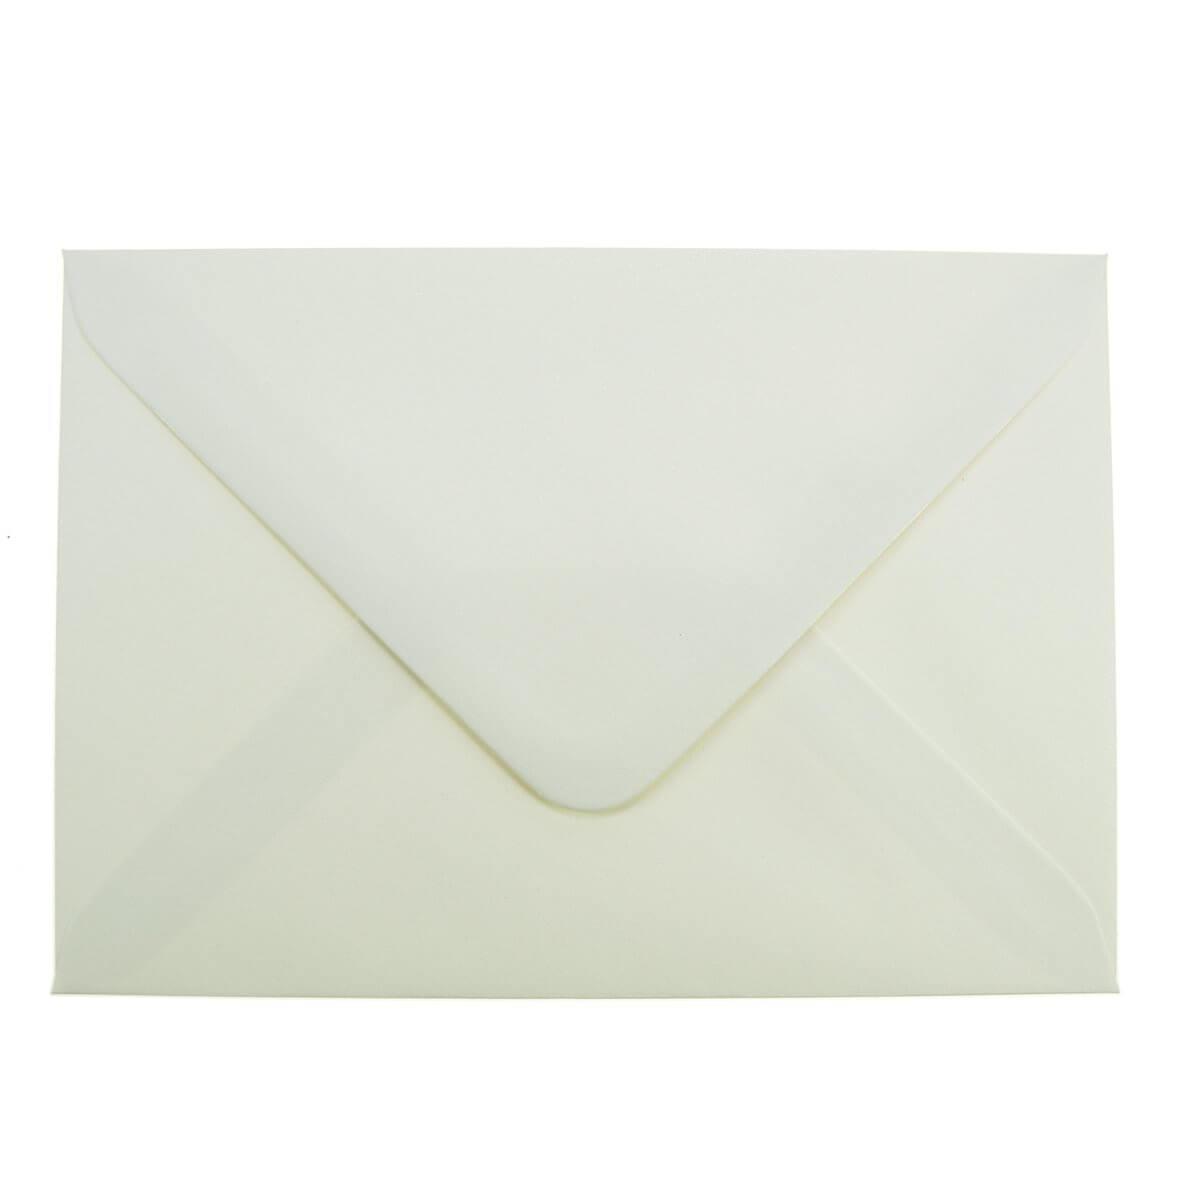 Ivory Sparkle C6 Envelope